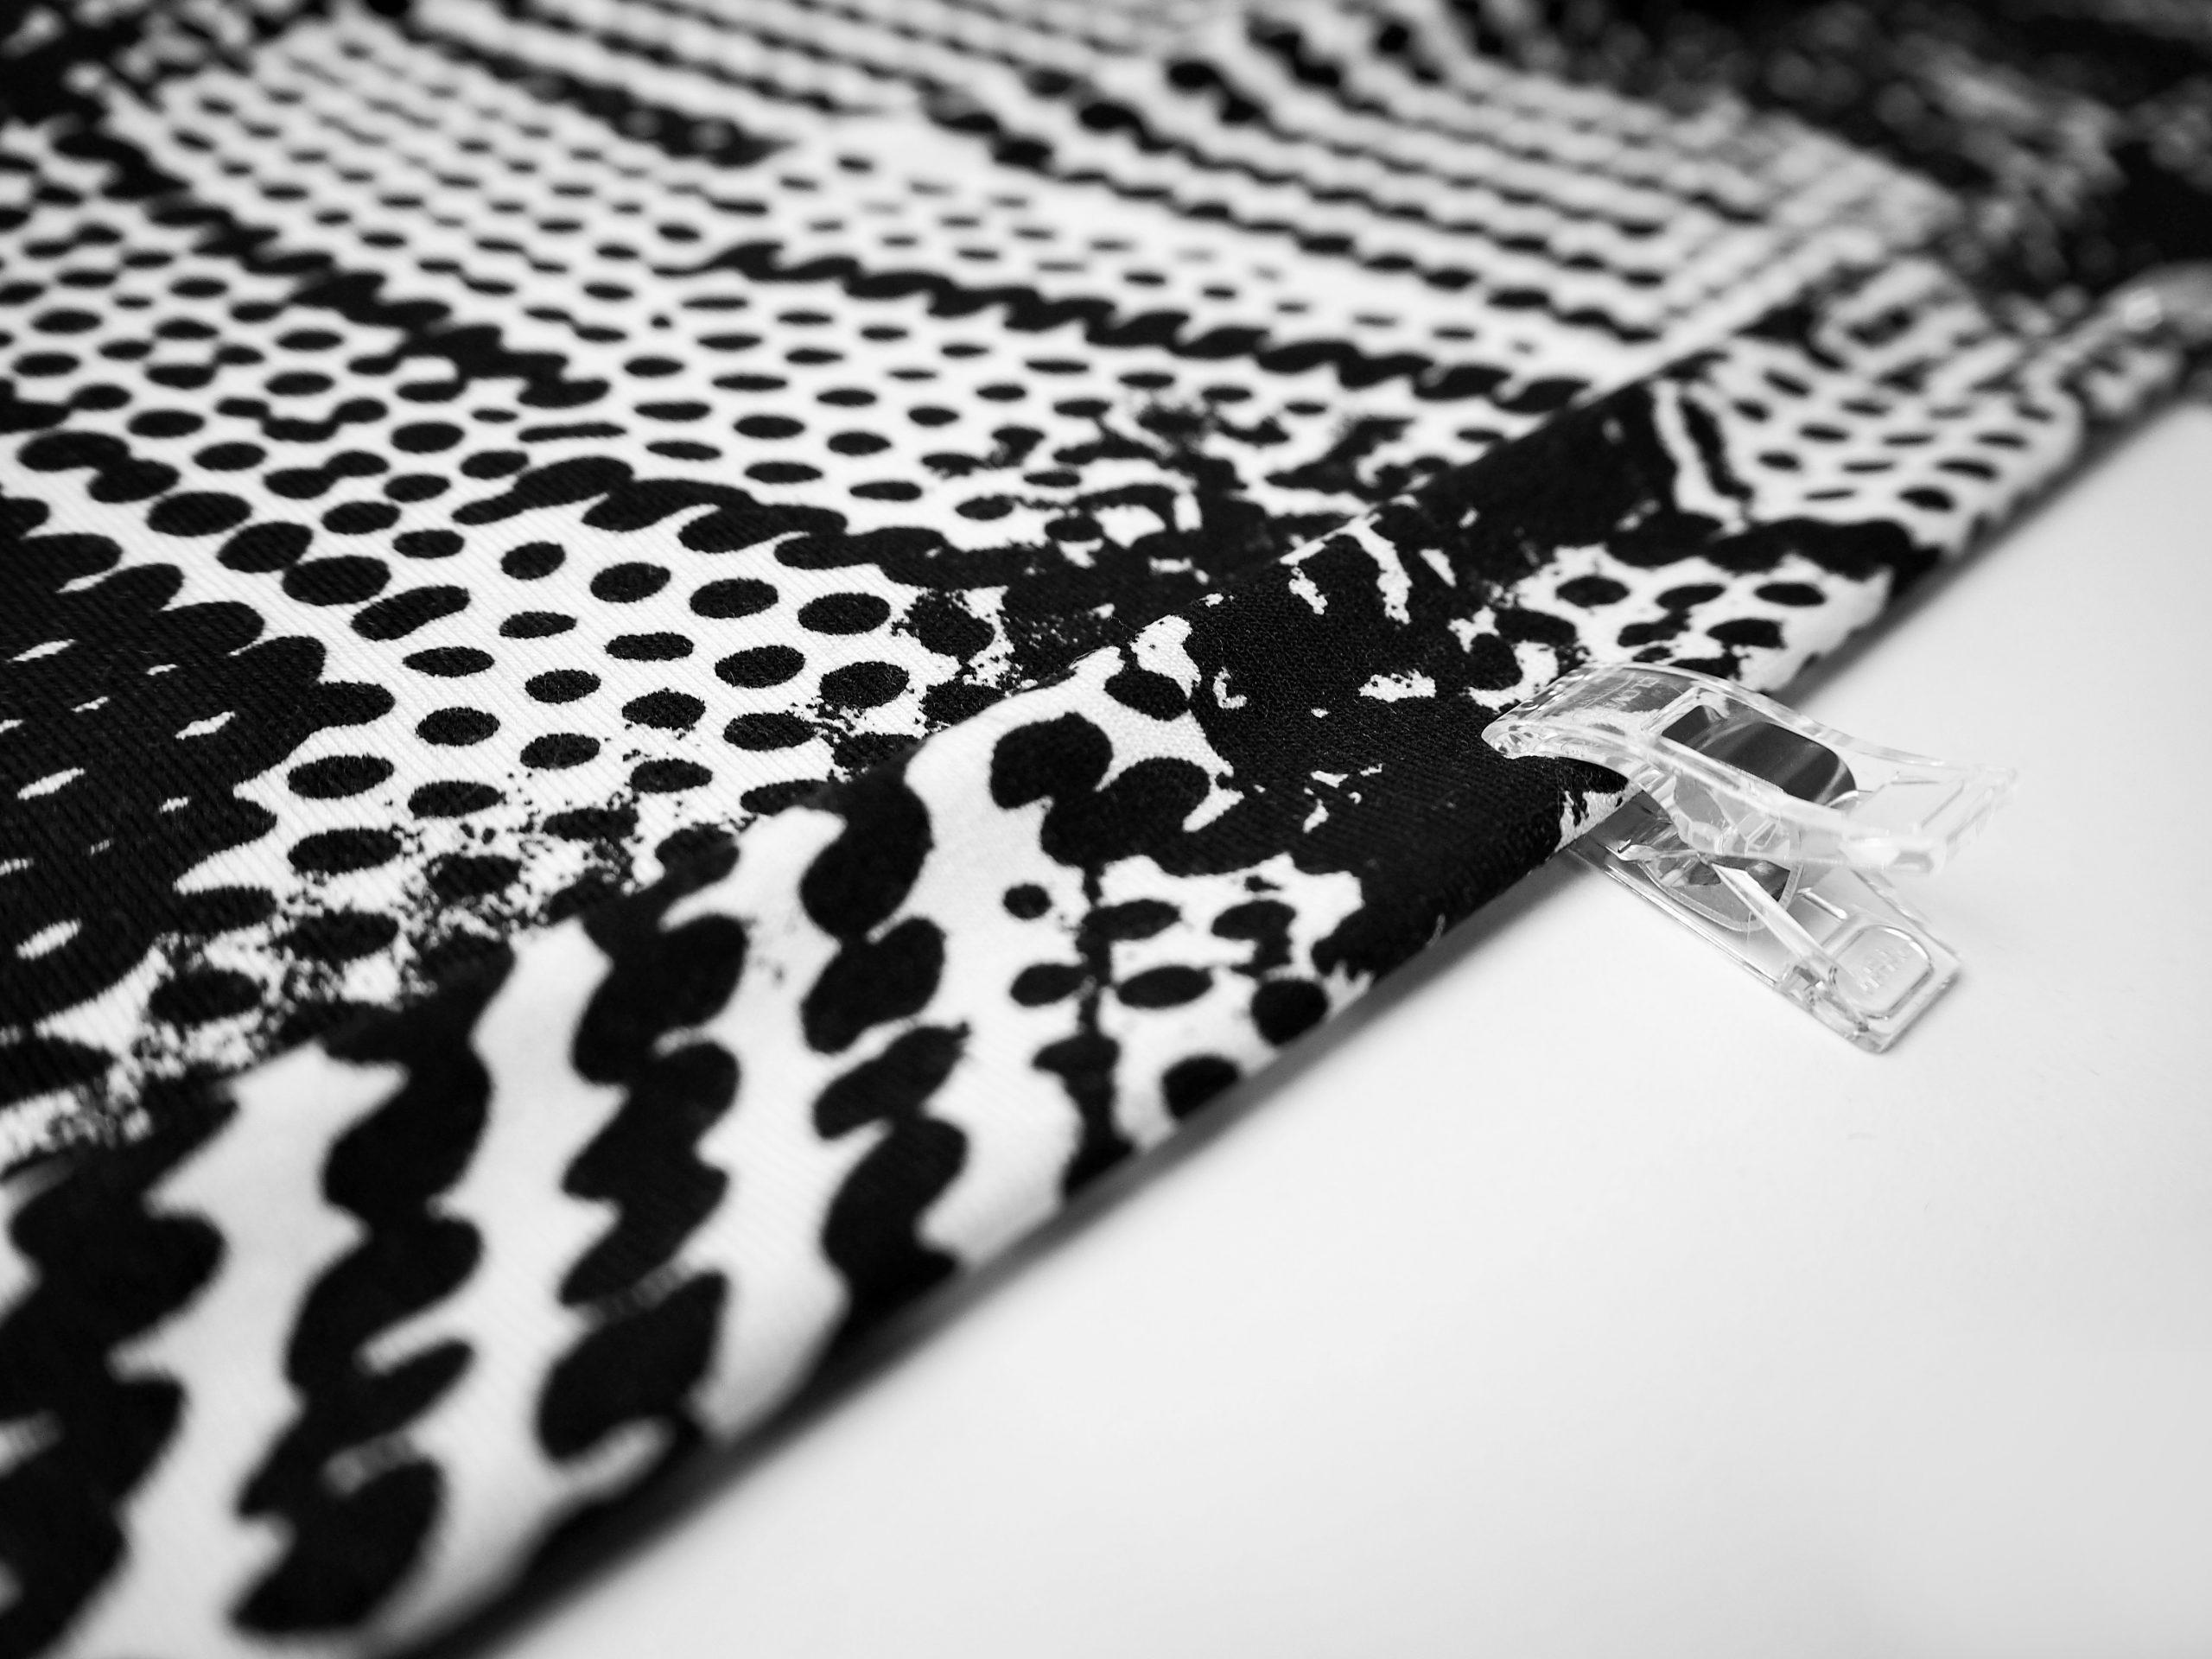 #minihack // Ärmelumschlag // T-Shirt FrauAmela von hedinäht